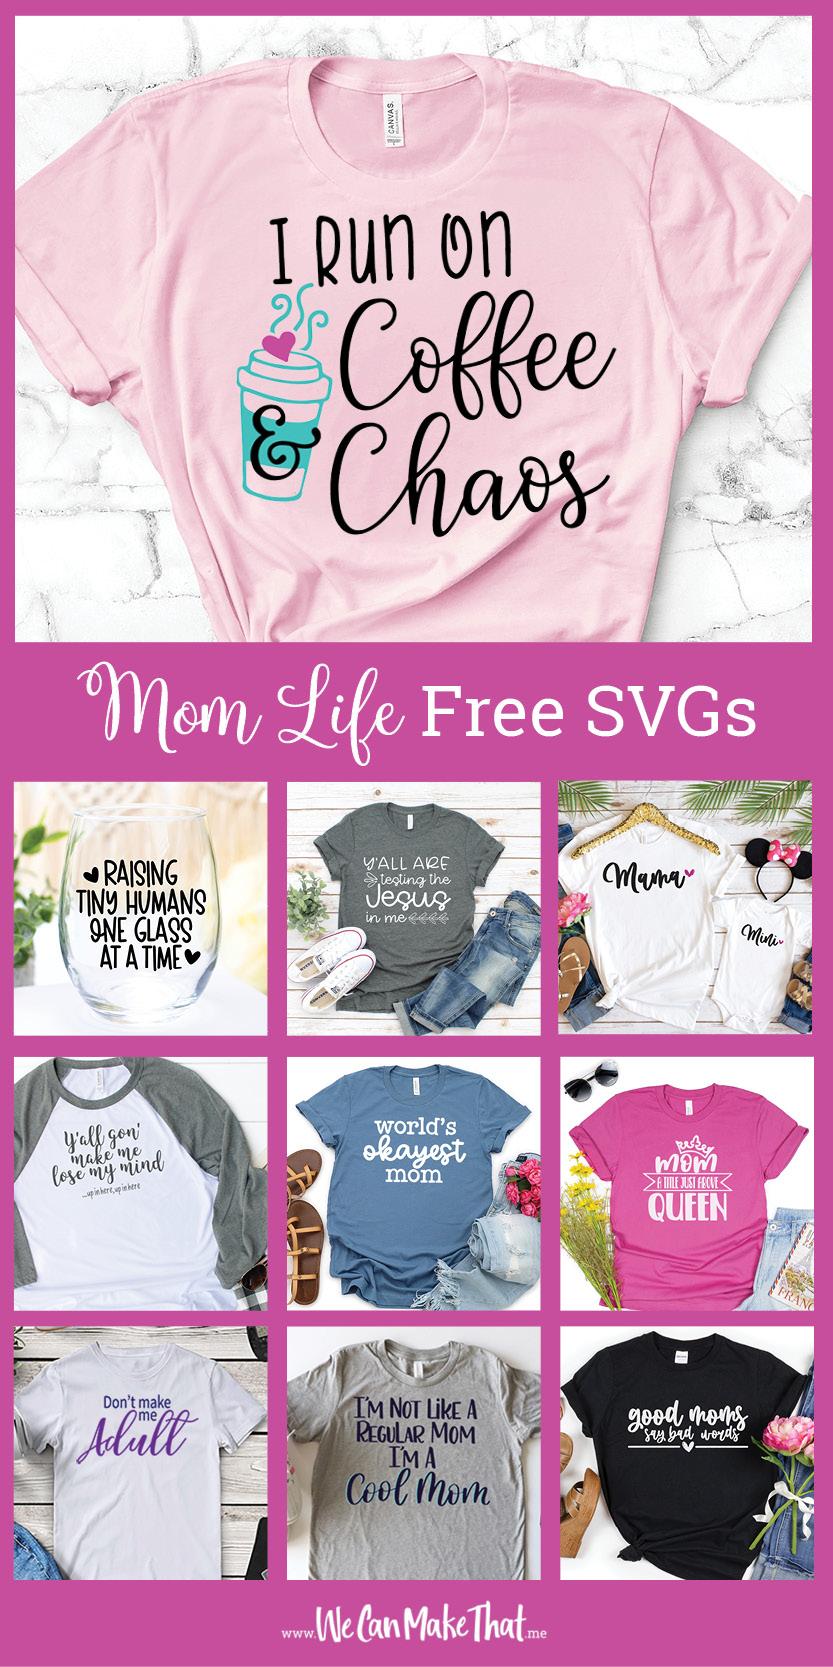 Mom life FREE SVGs